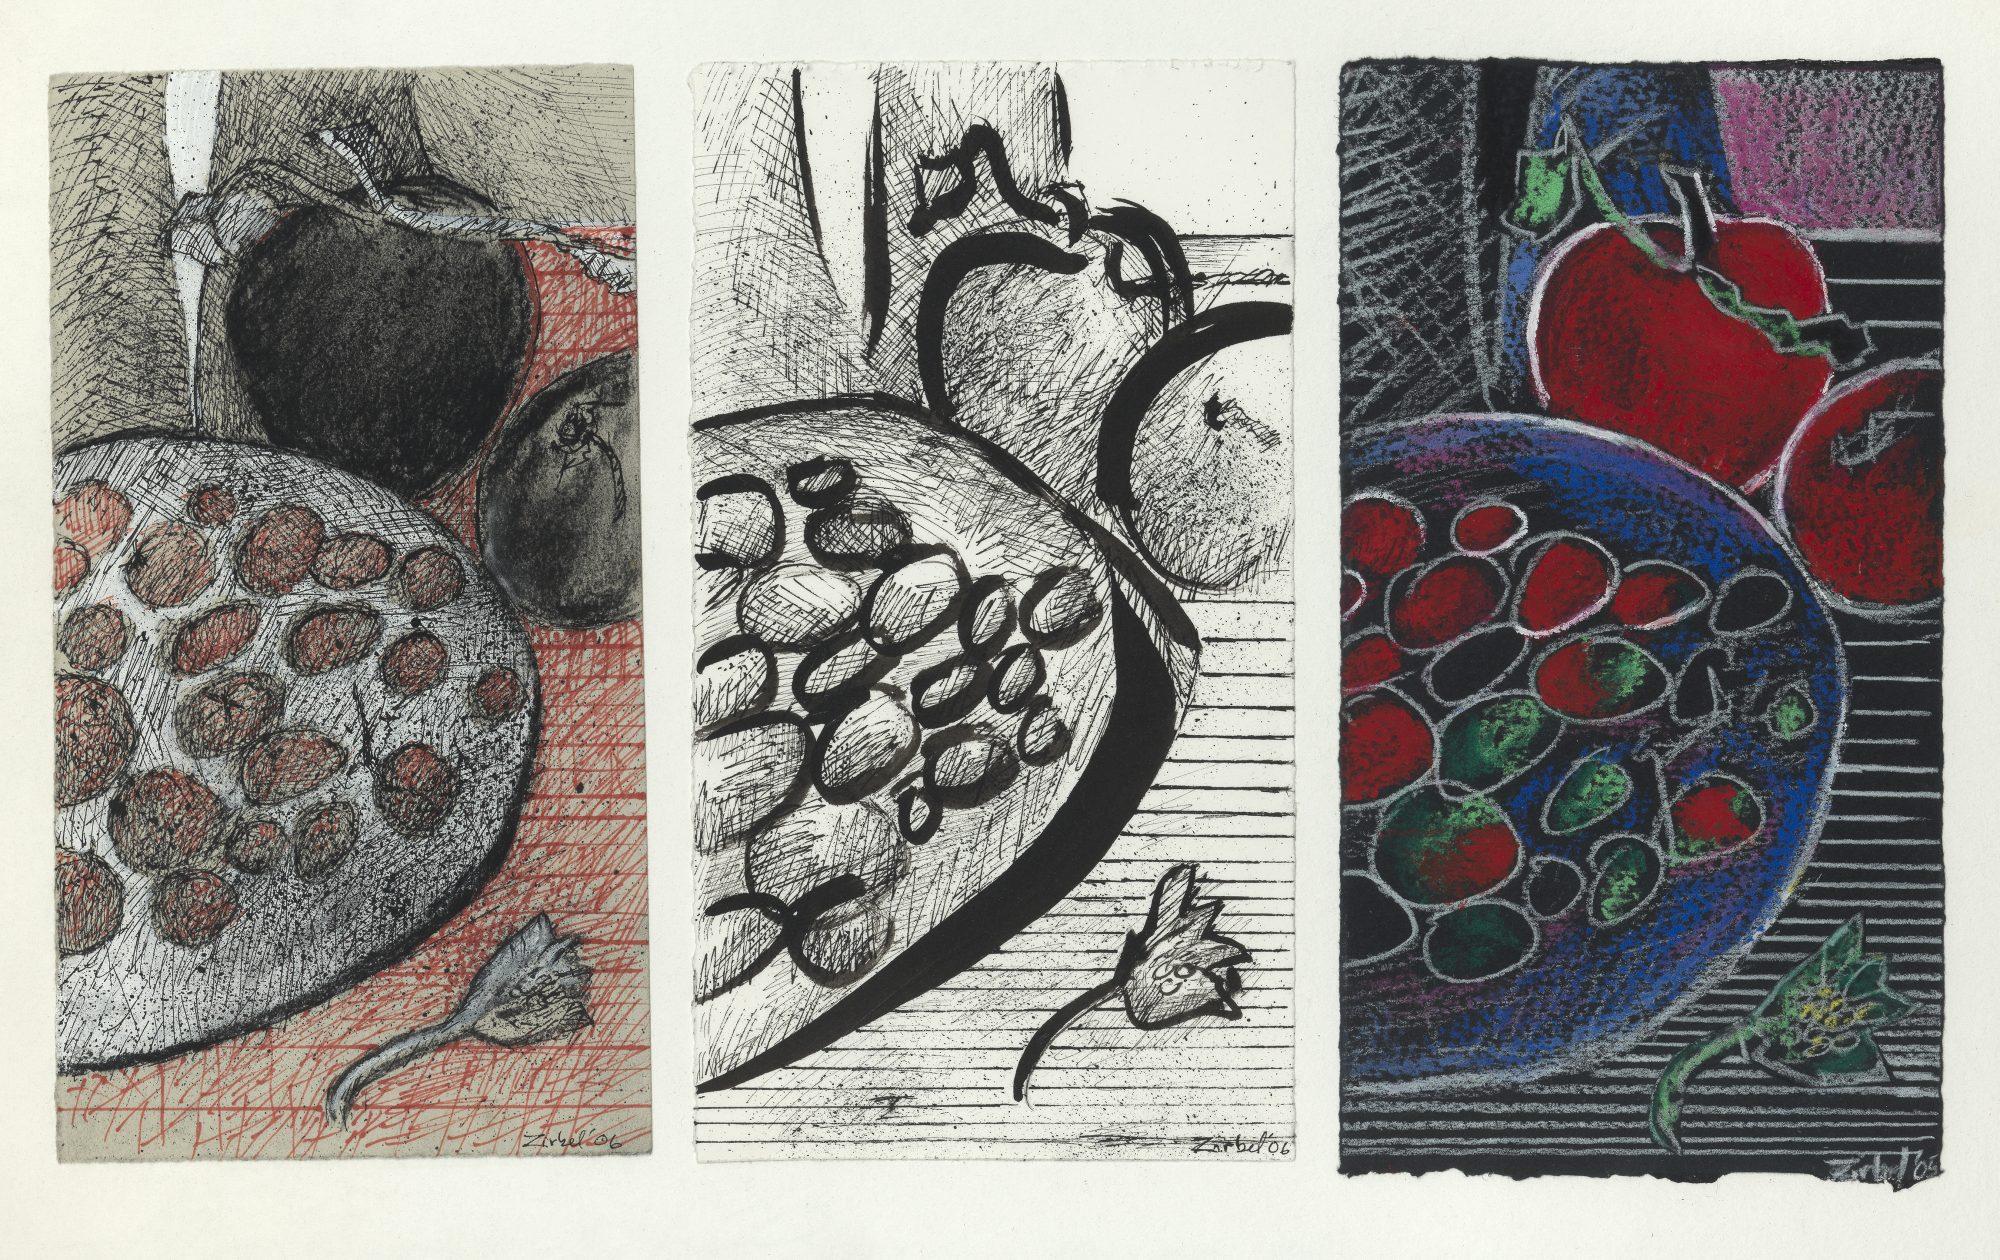 Frank Joseph Zirbel (American, b. 1947) Apple Still Life Studies (triptych)